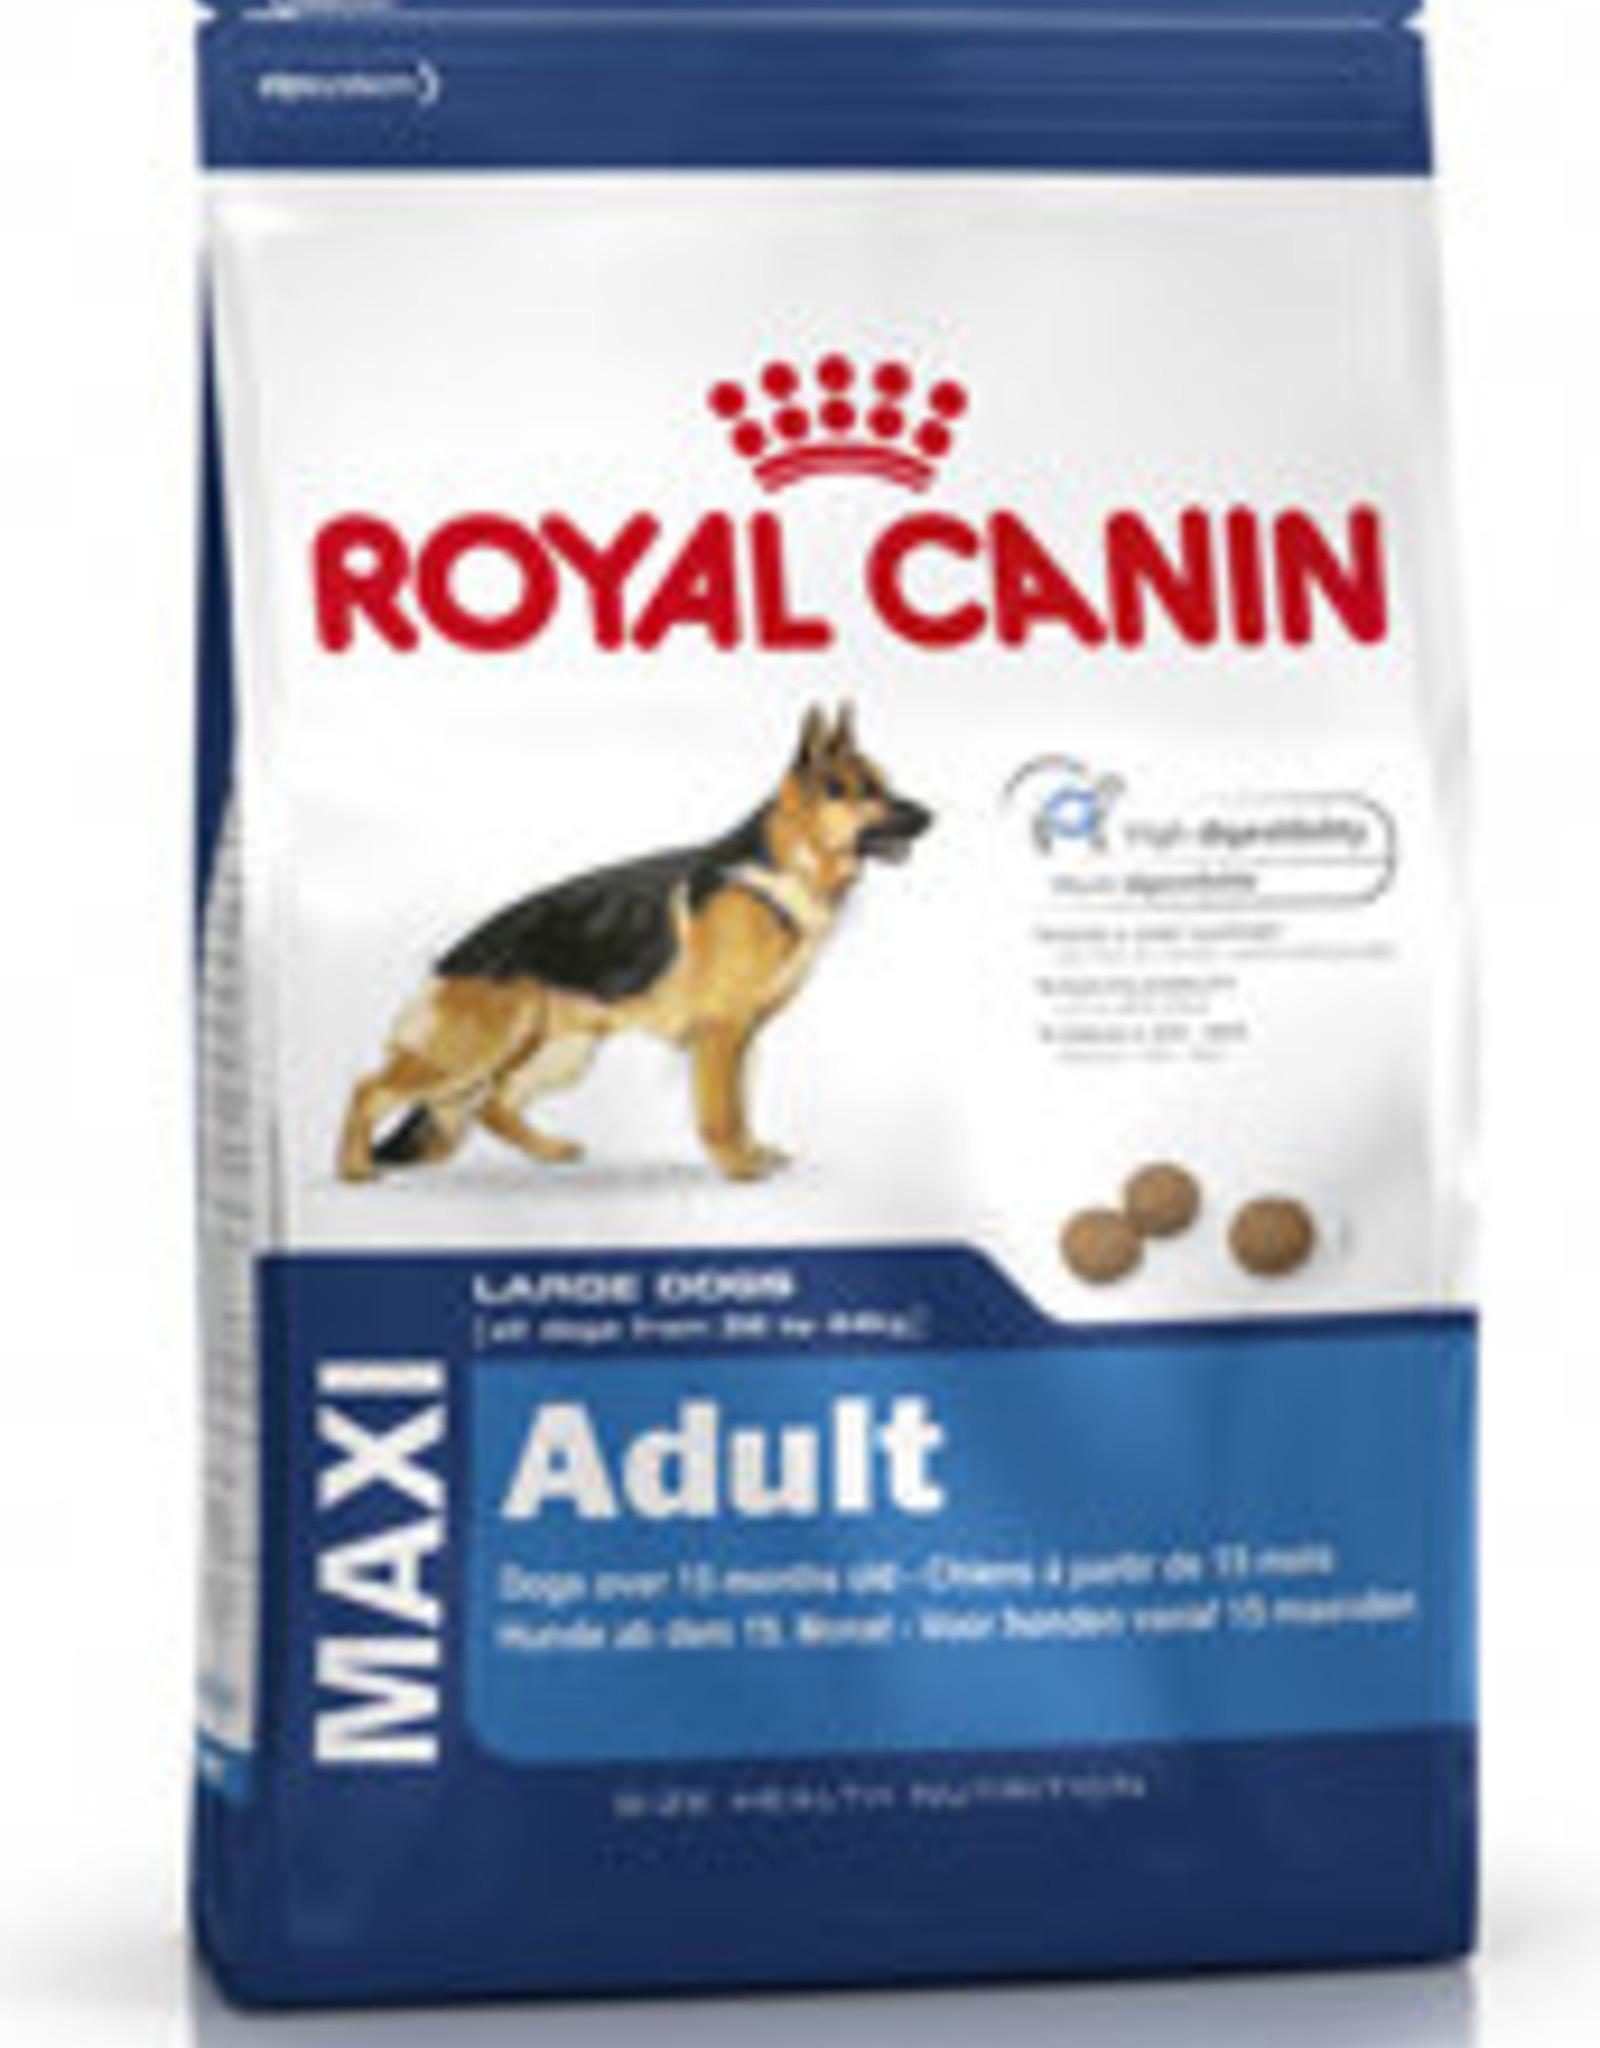 Royal Canin Royal Canin Shn Maxi Adult Dog 10kg